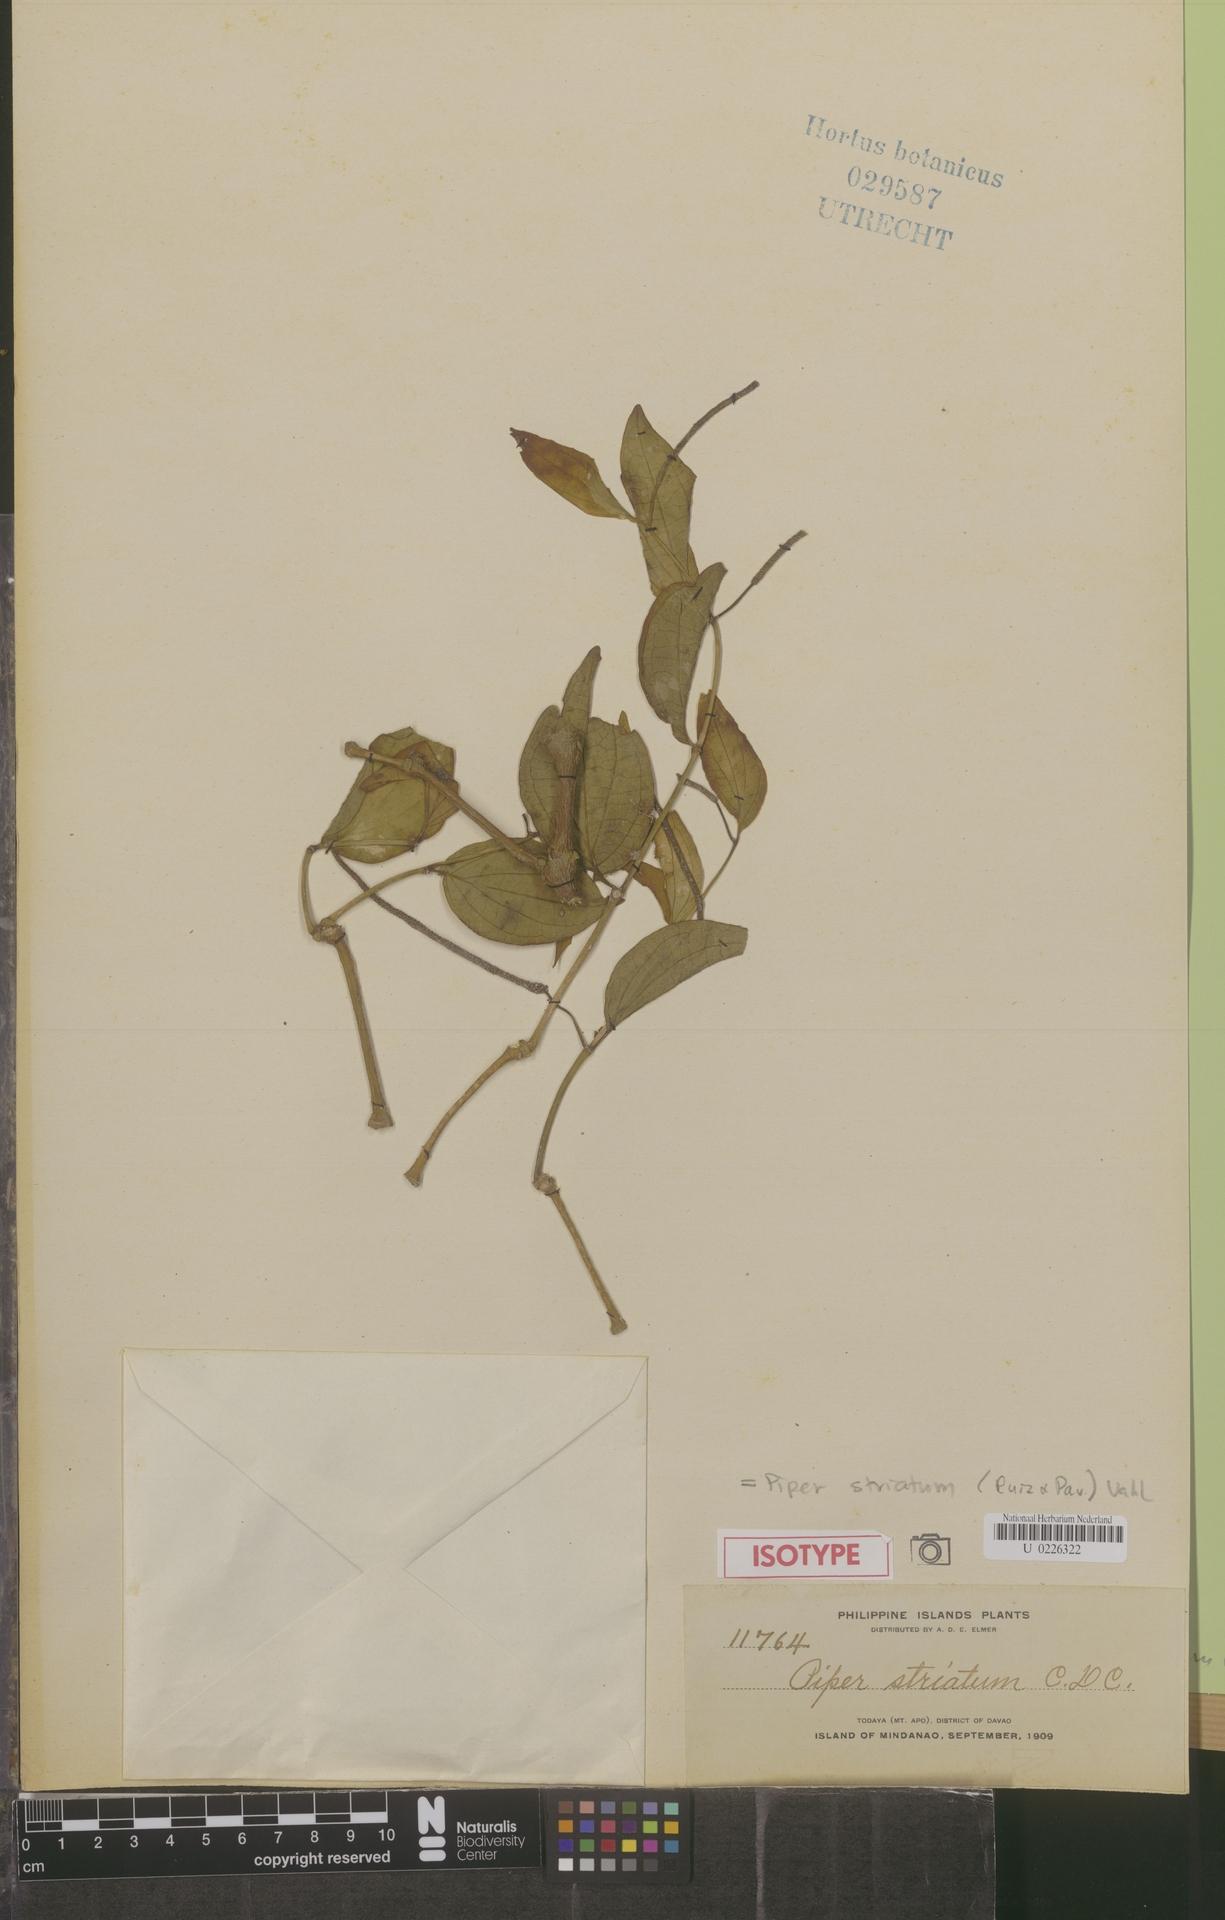 U  0226322 | Piper striatum (Ruiz & Pav.) Vahl